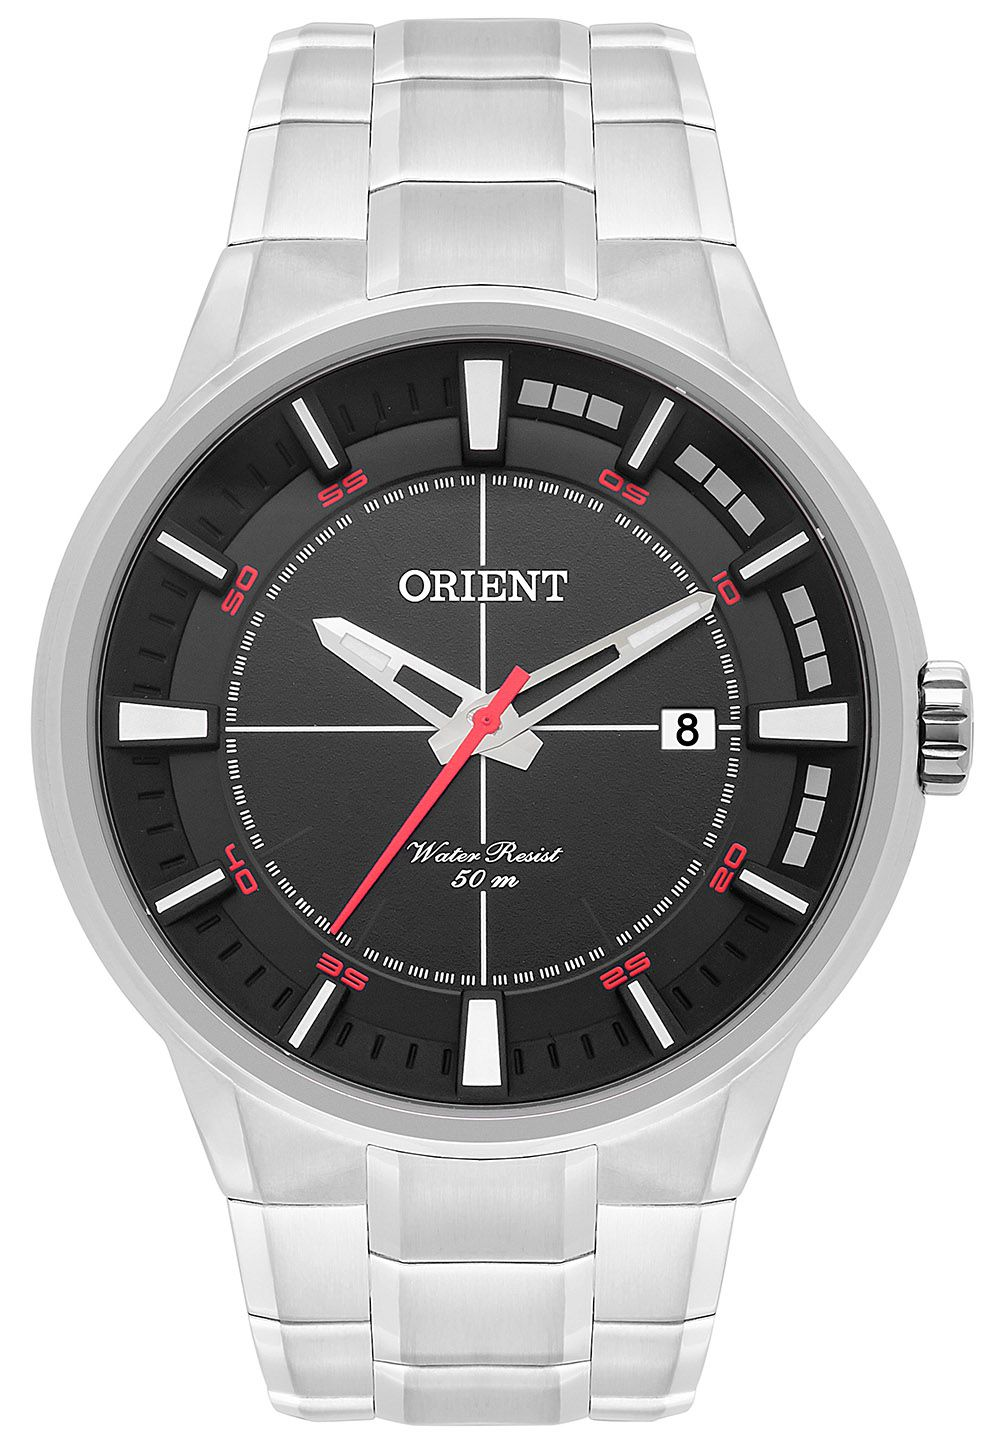 Relógio Masculino Casual Prata MBSS1308-P2SX Orient